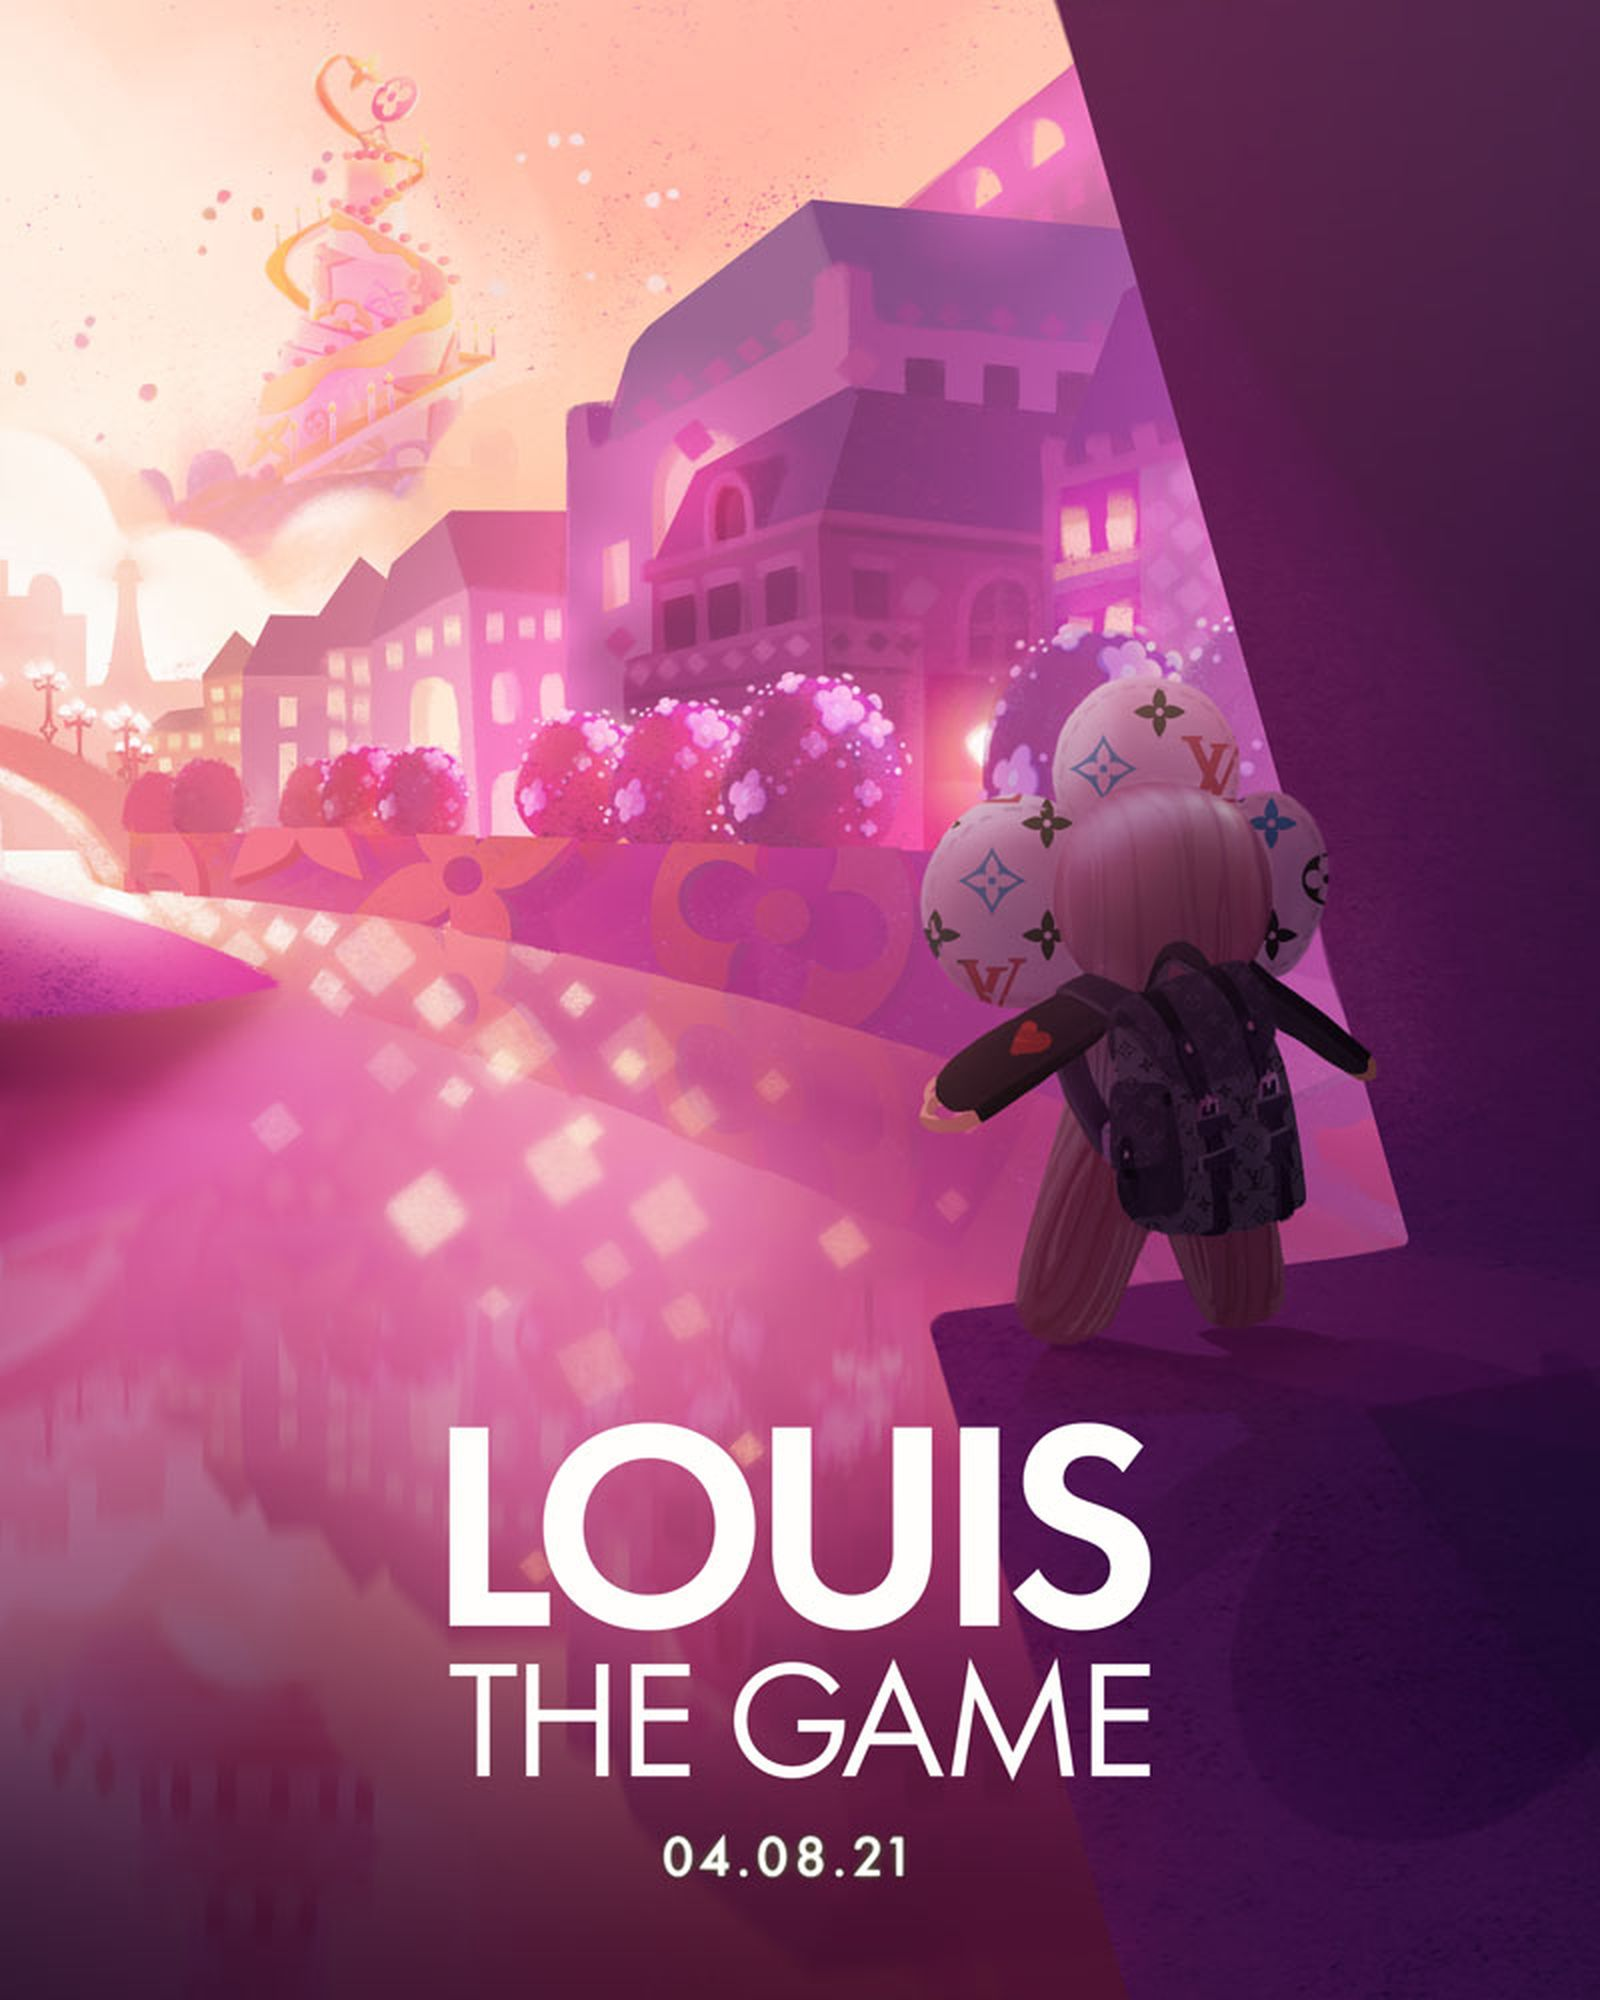 louis-vuitton-nft-game-06